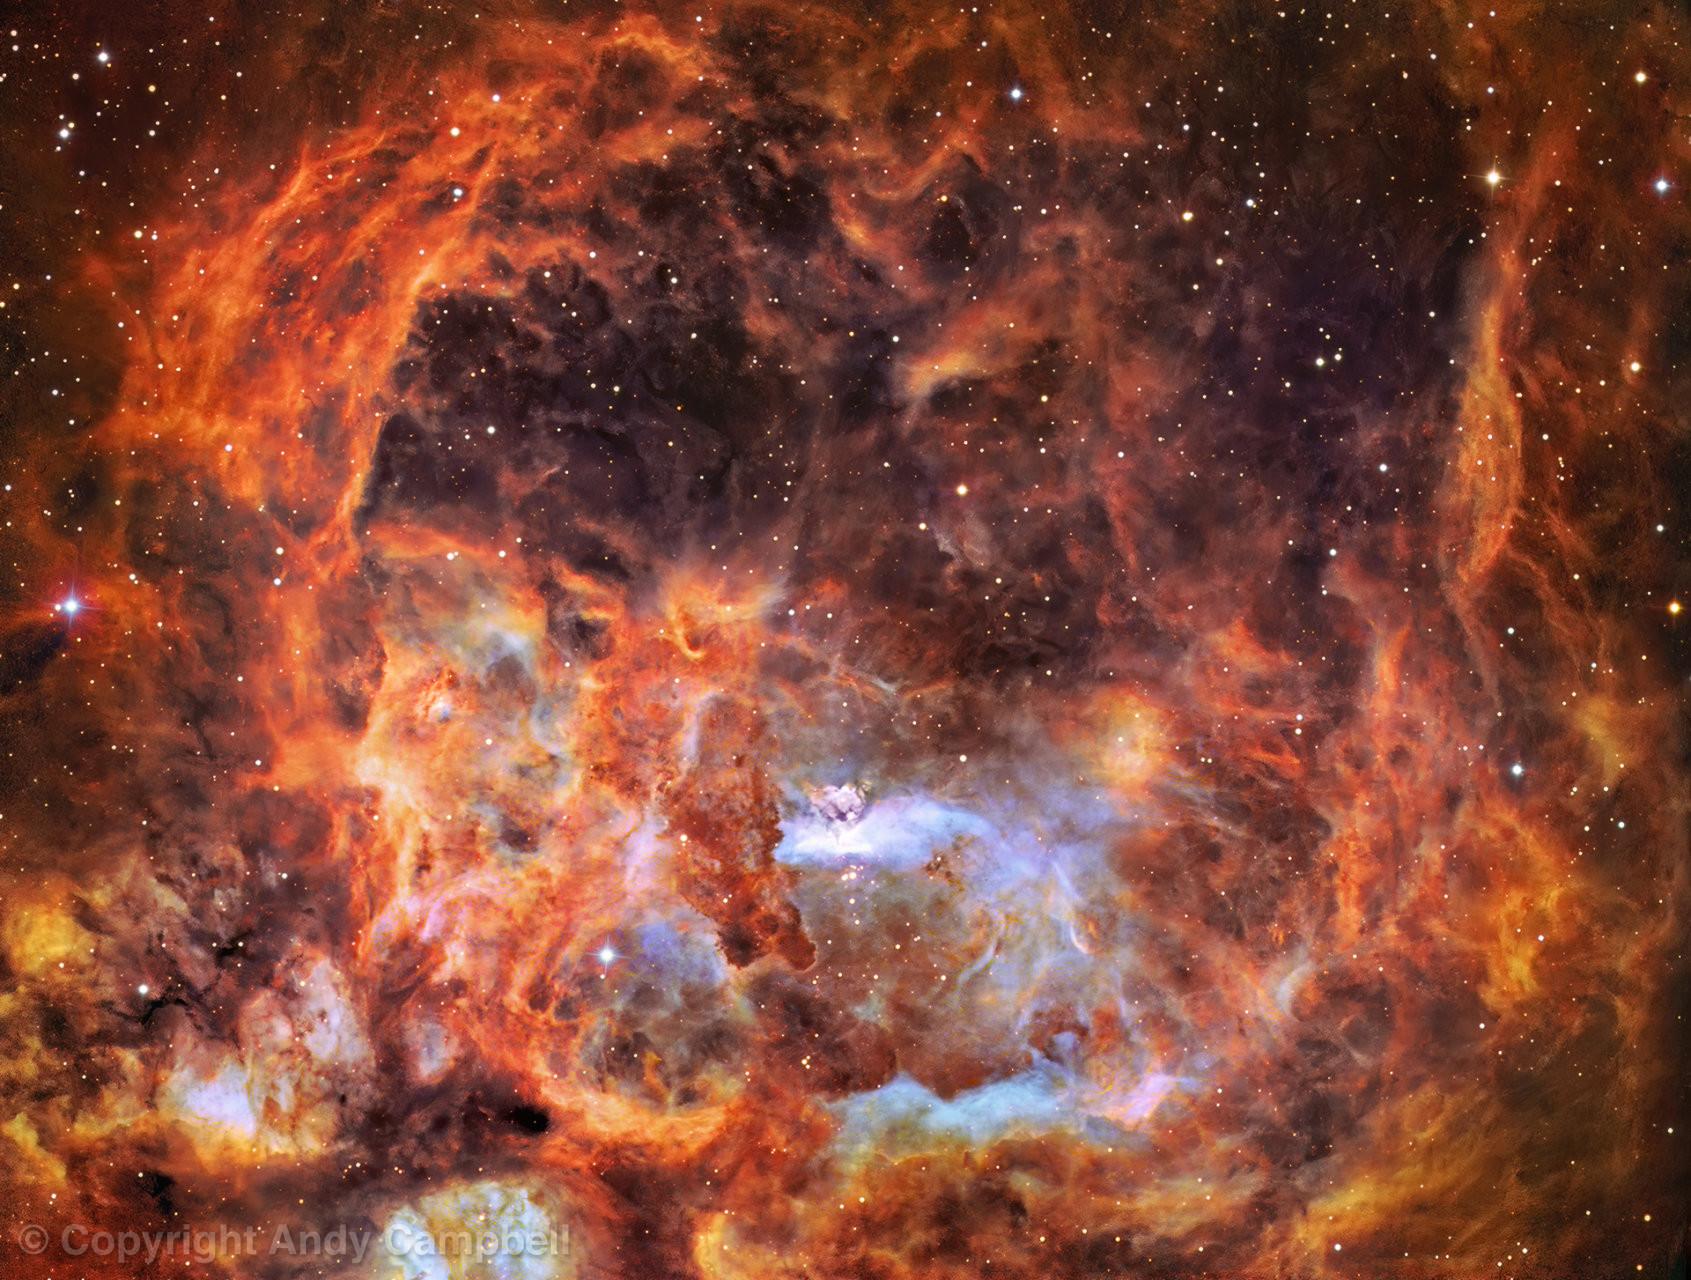 NGC 6537 Nebula in Narrowband